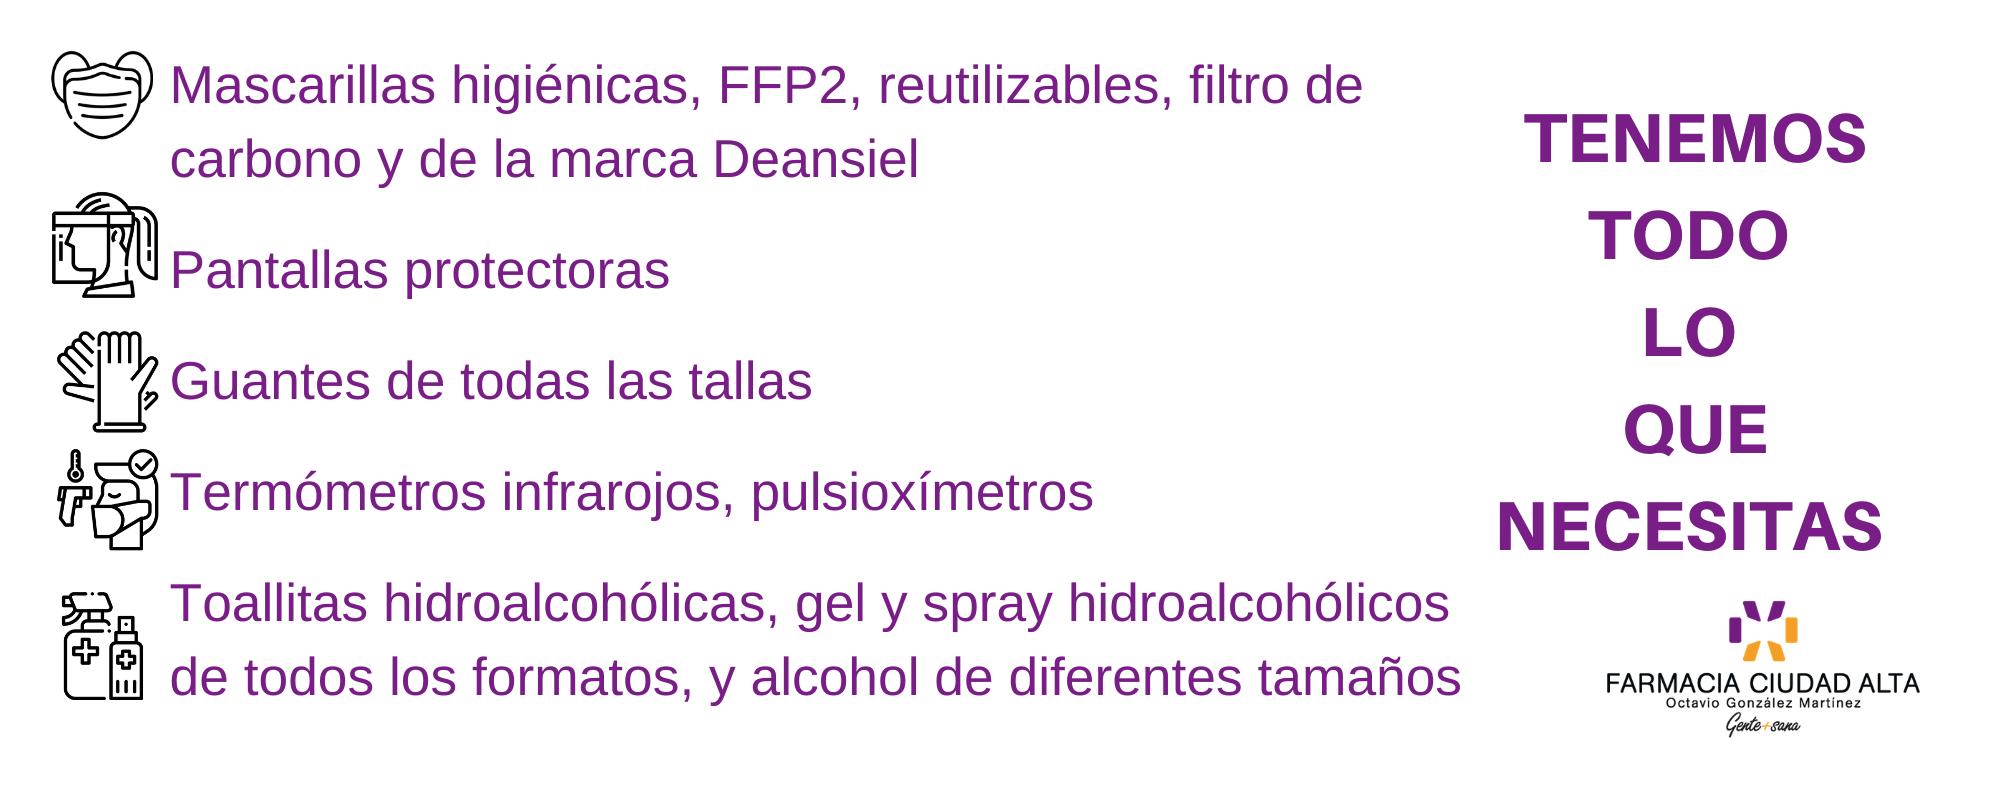 2000 x 800 - Banner Farmacia Ciudad Alta mascarillas COVID-19